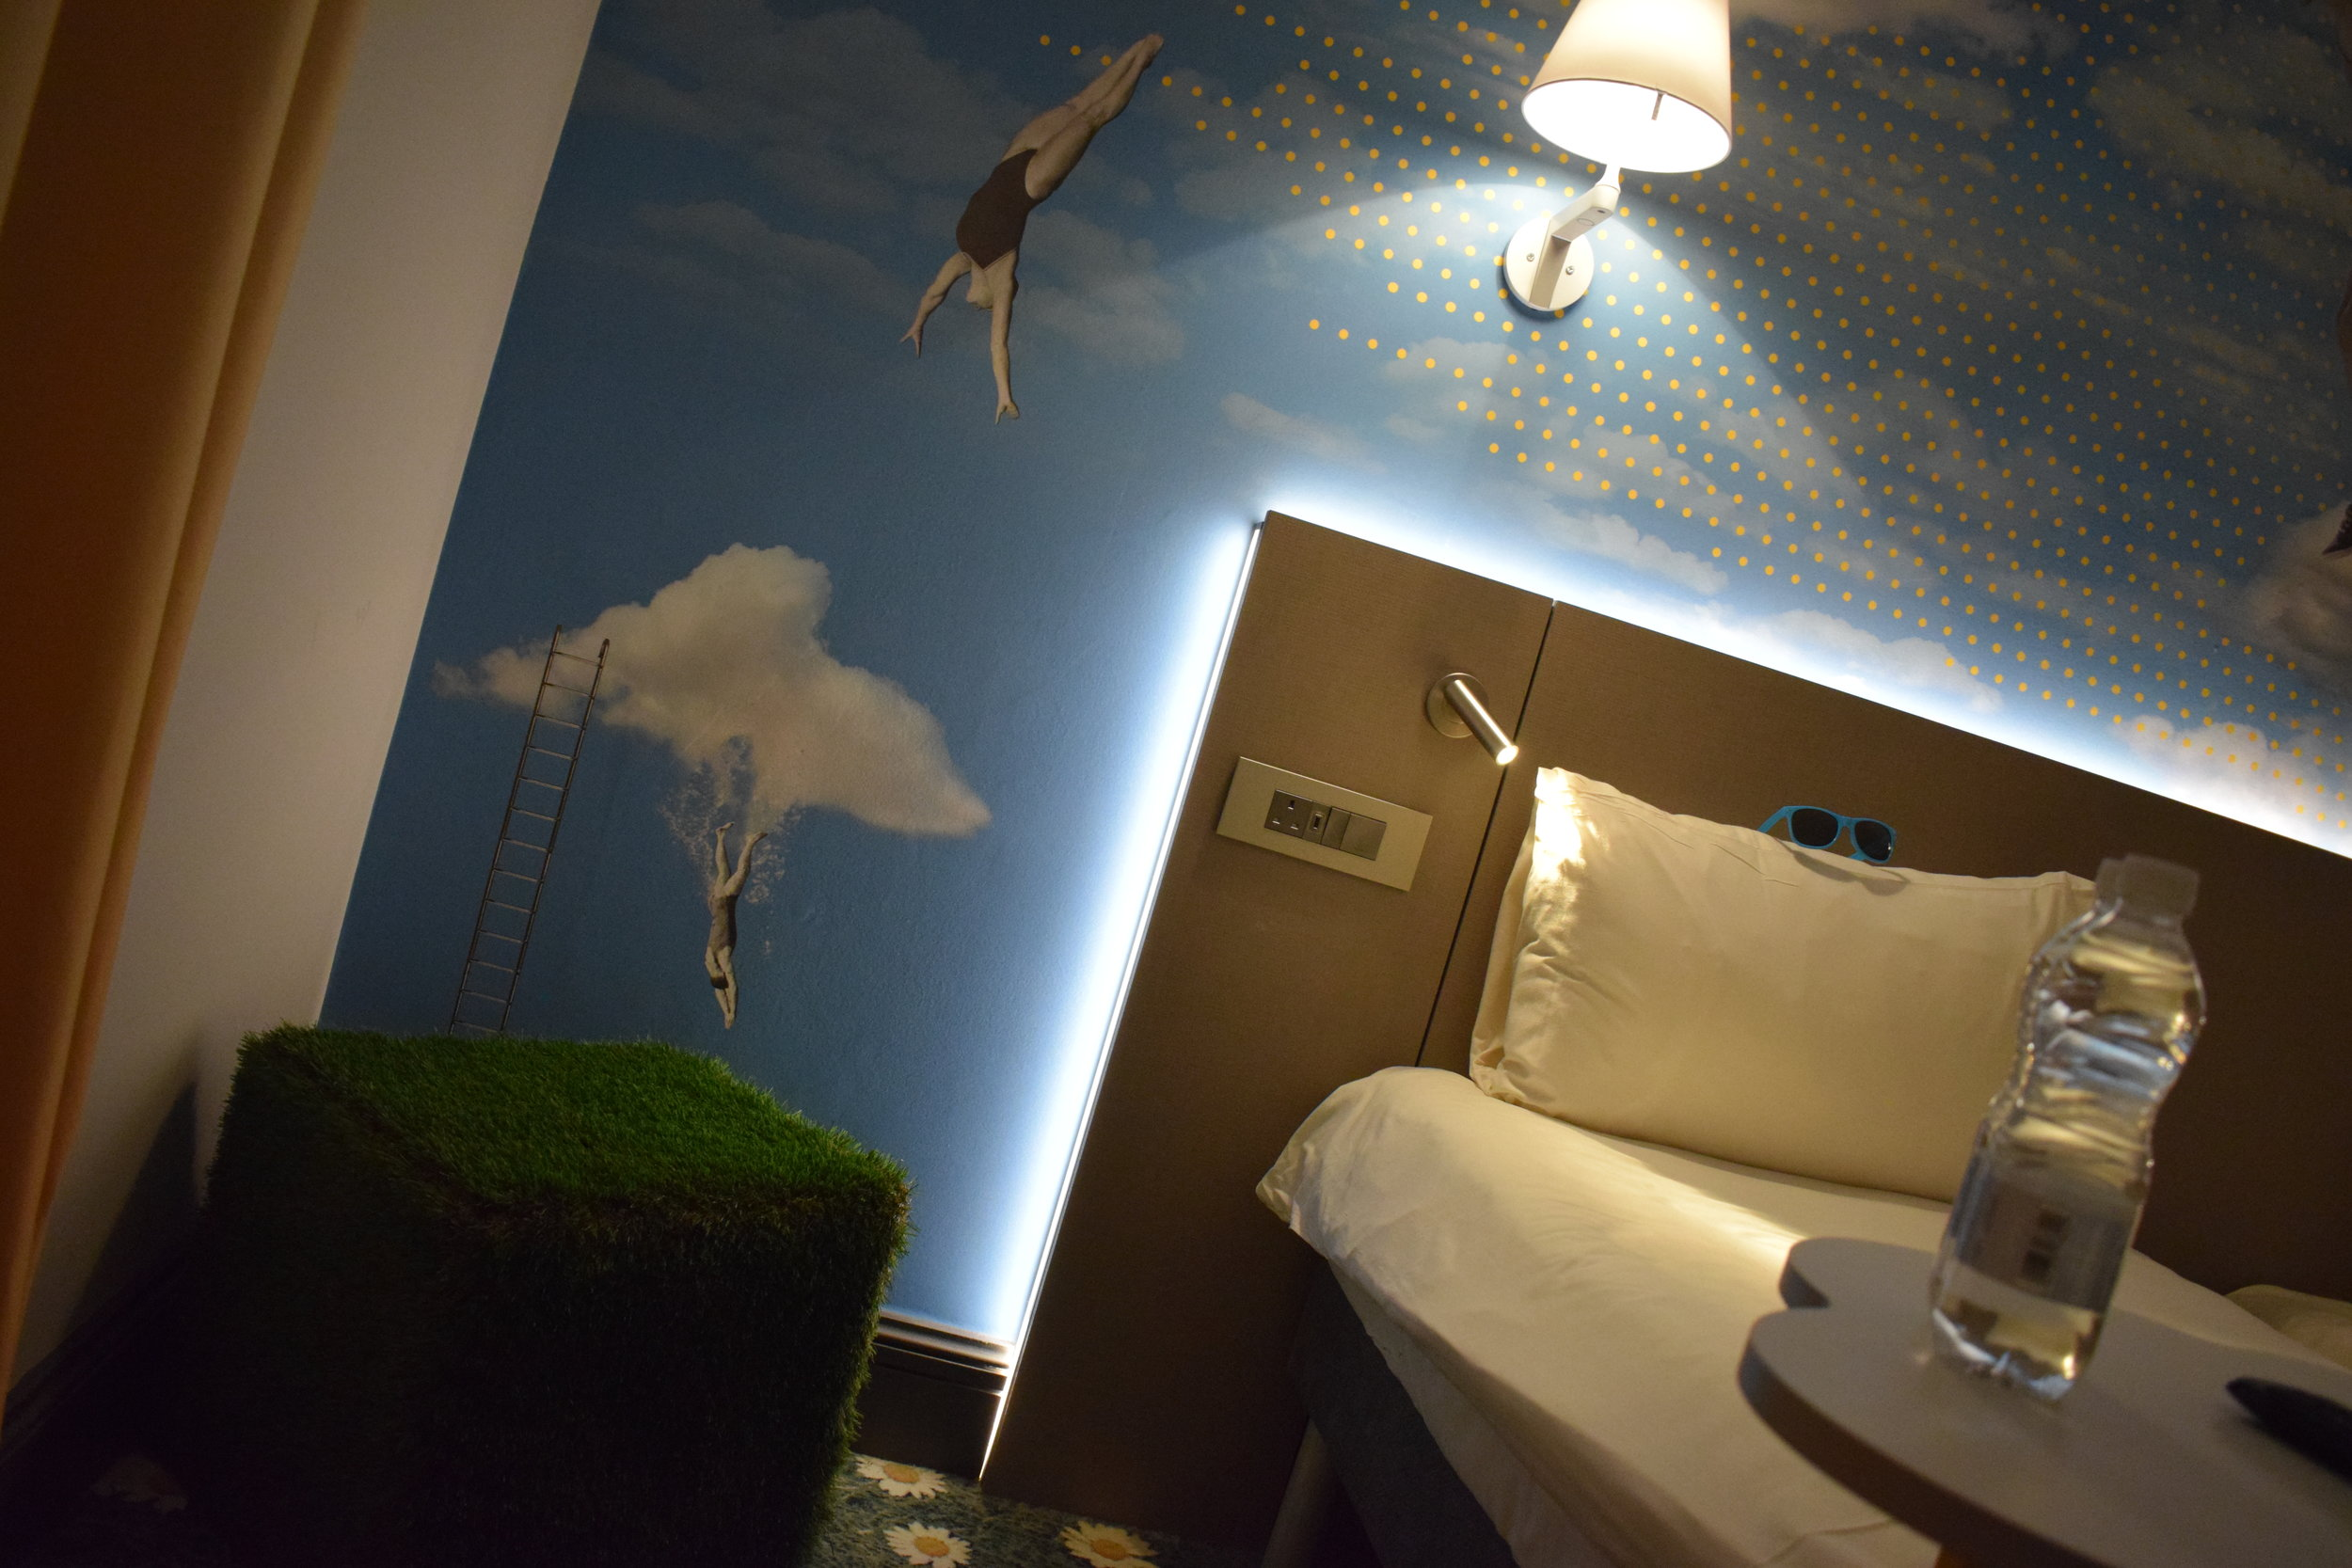 Ibis-Styles-Hotel-Summer-Room